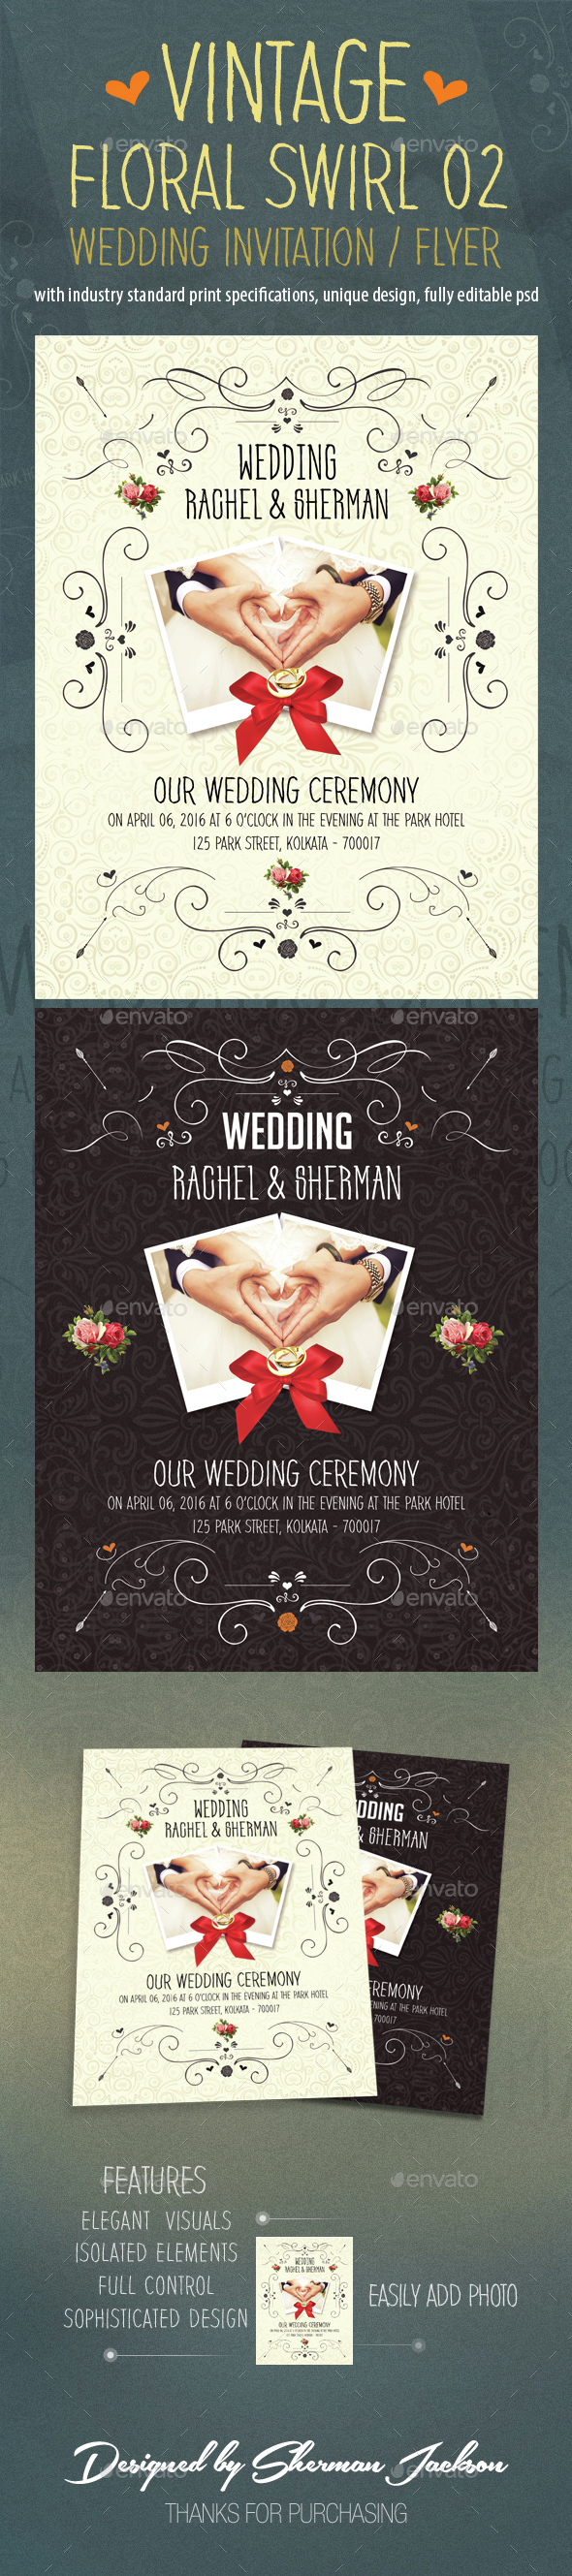 Vintage Floral Swirl Wedding Flyer/Invitation 02